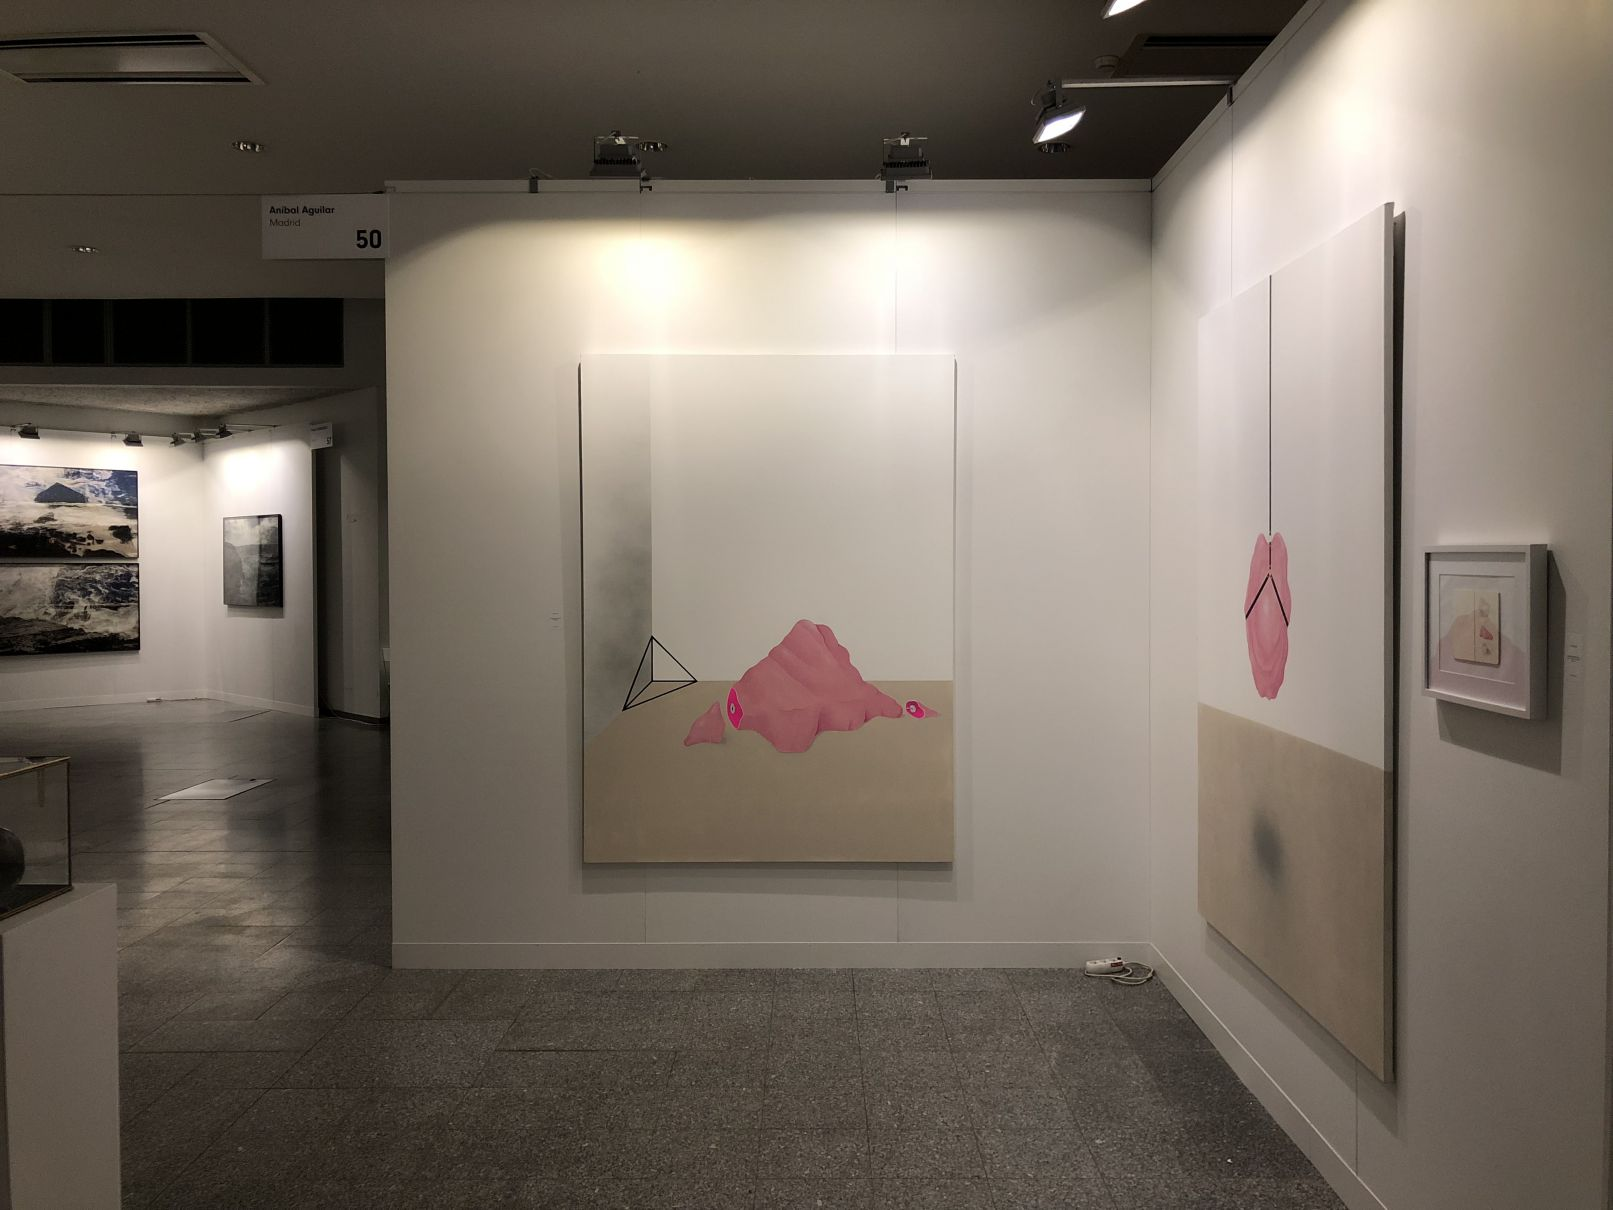 Sideshow series (2018) - Aníbal Aguilar